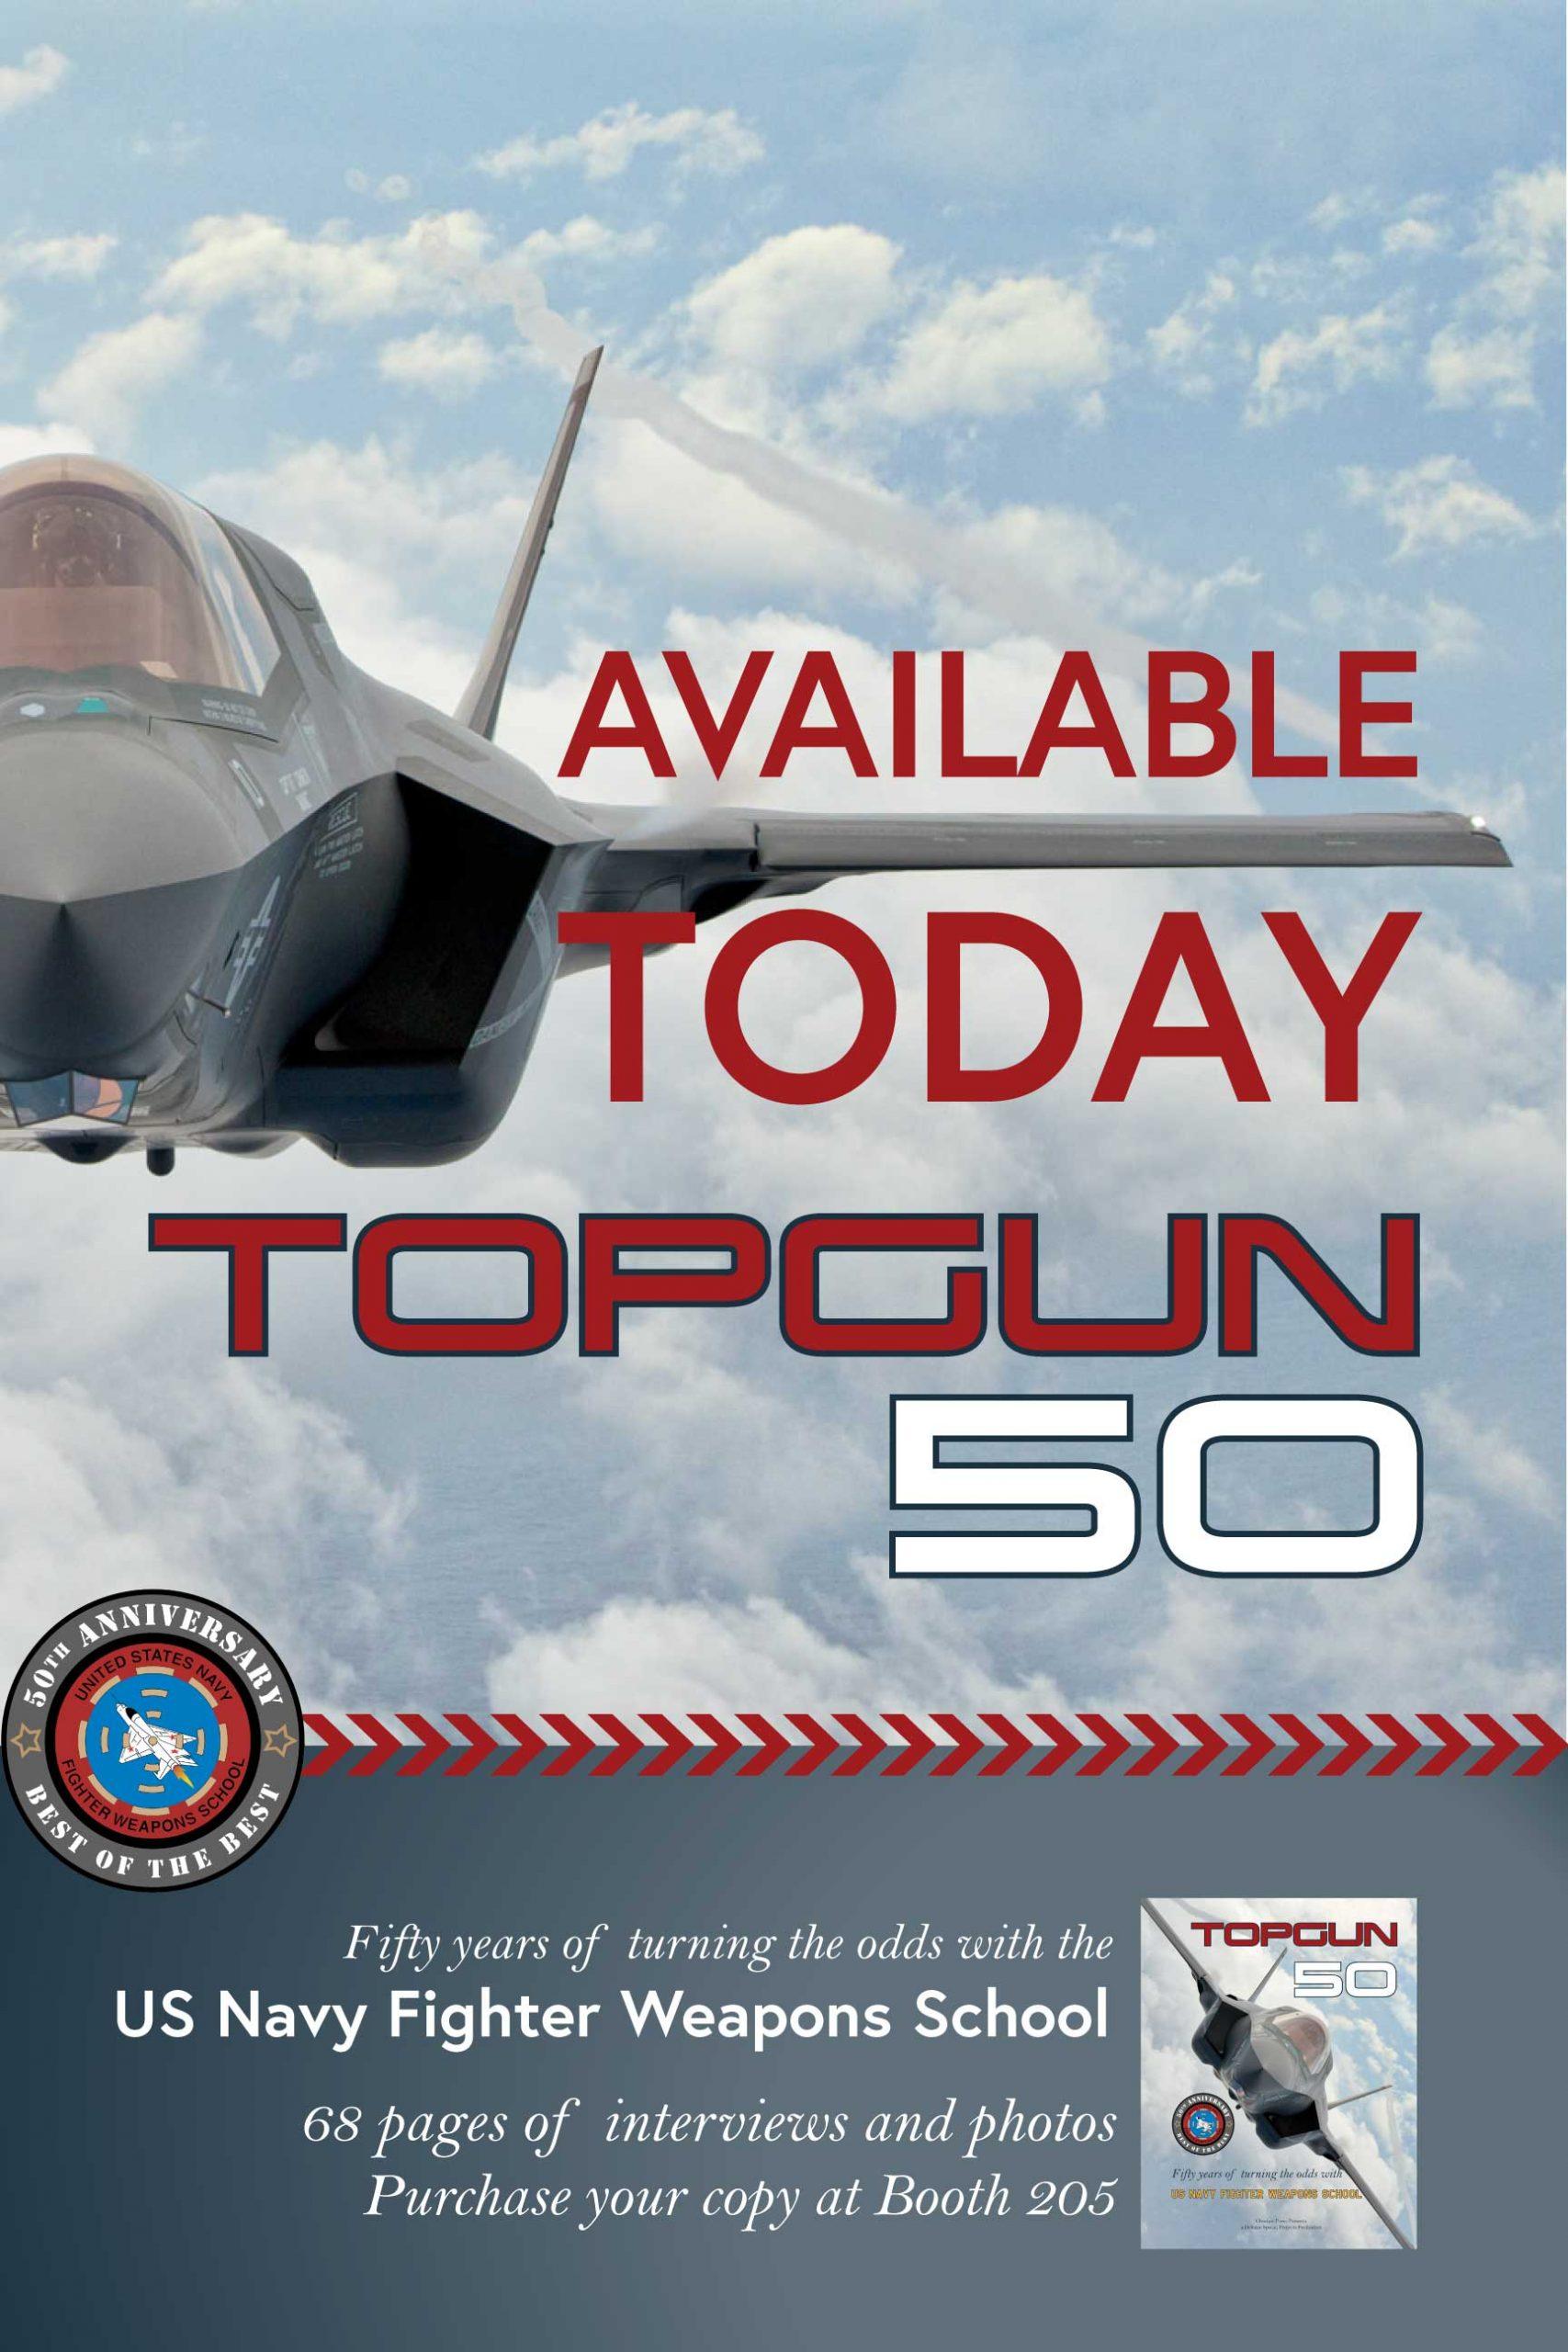 TopGun50-promo-poster